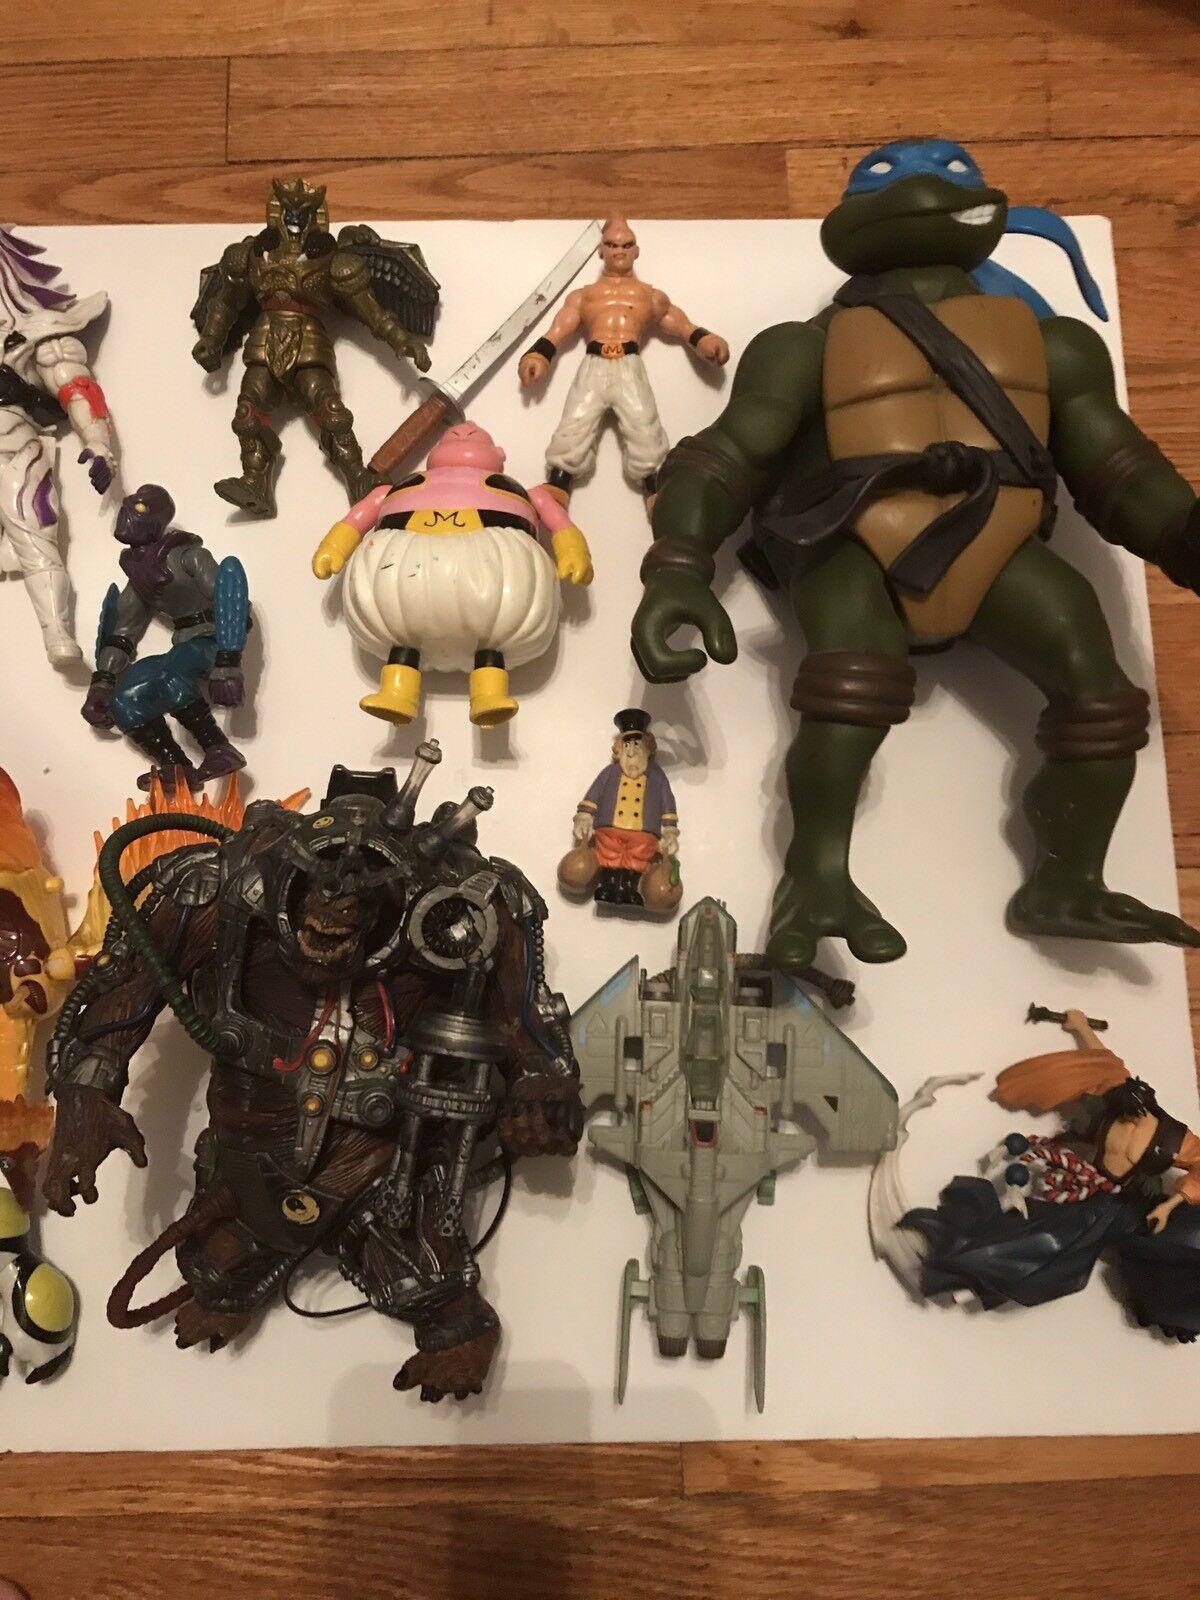 TMNT Ben 10 10 10 DBZ Power Rangers Action Figures Mixed Lot 80's 90's & 2000's 1e7f81